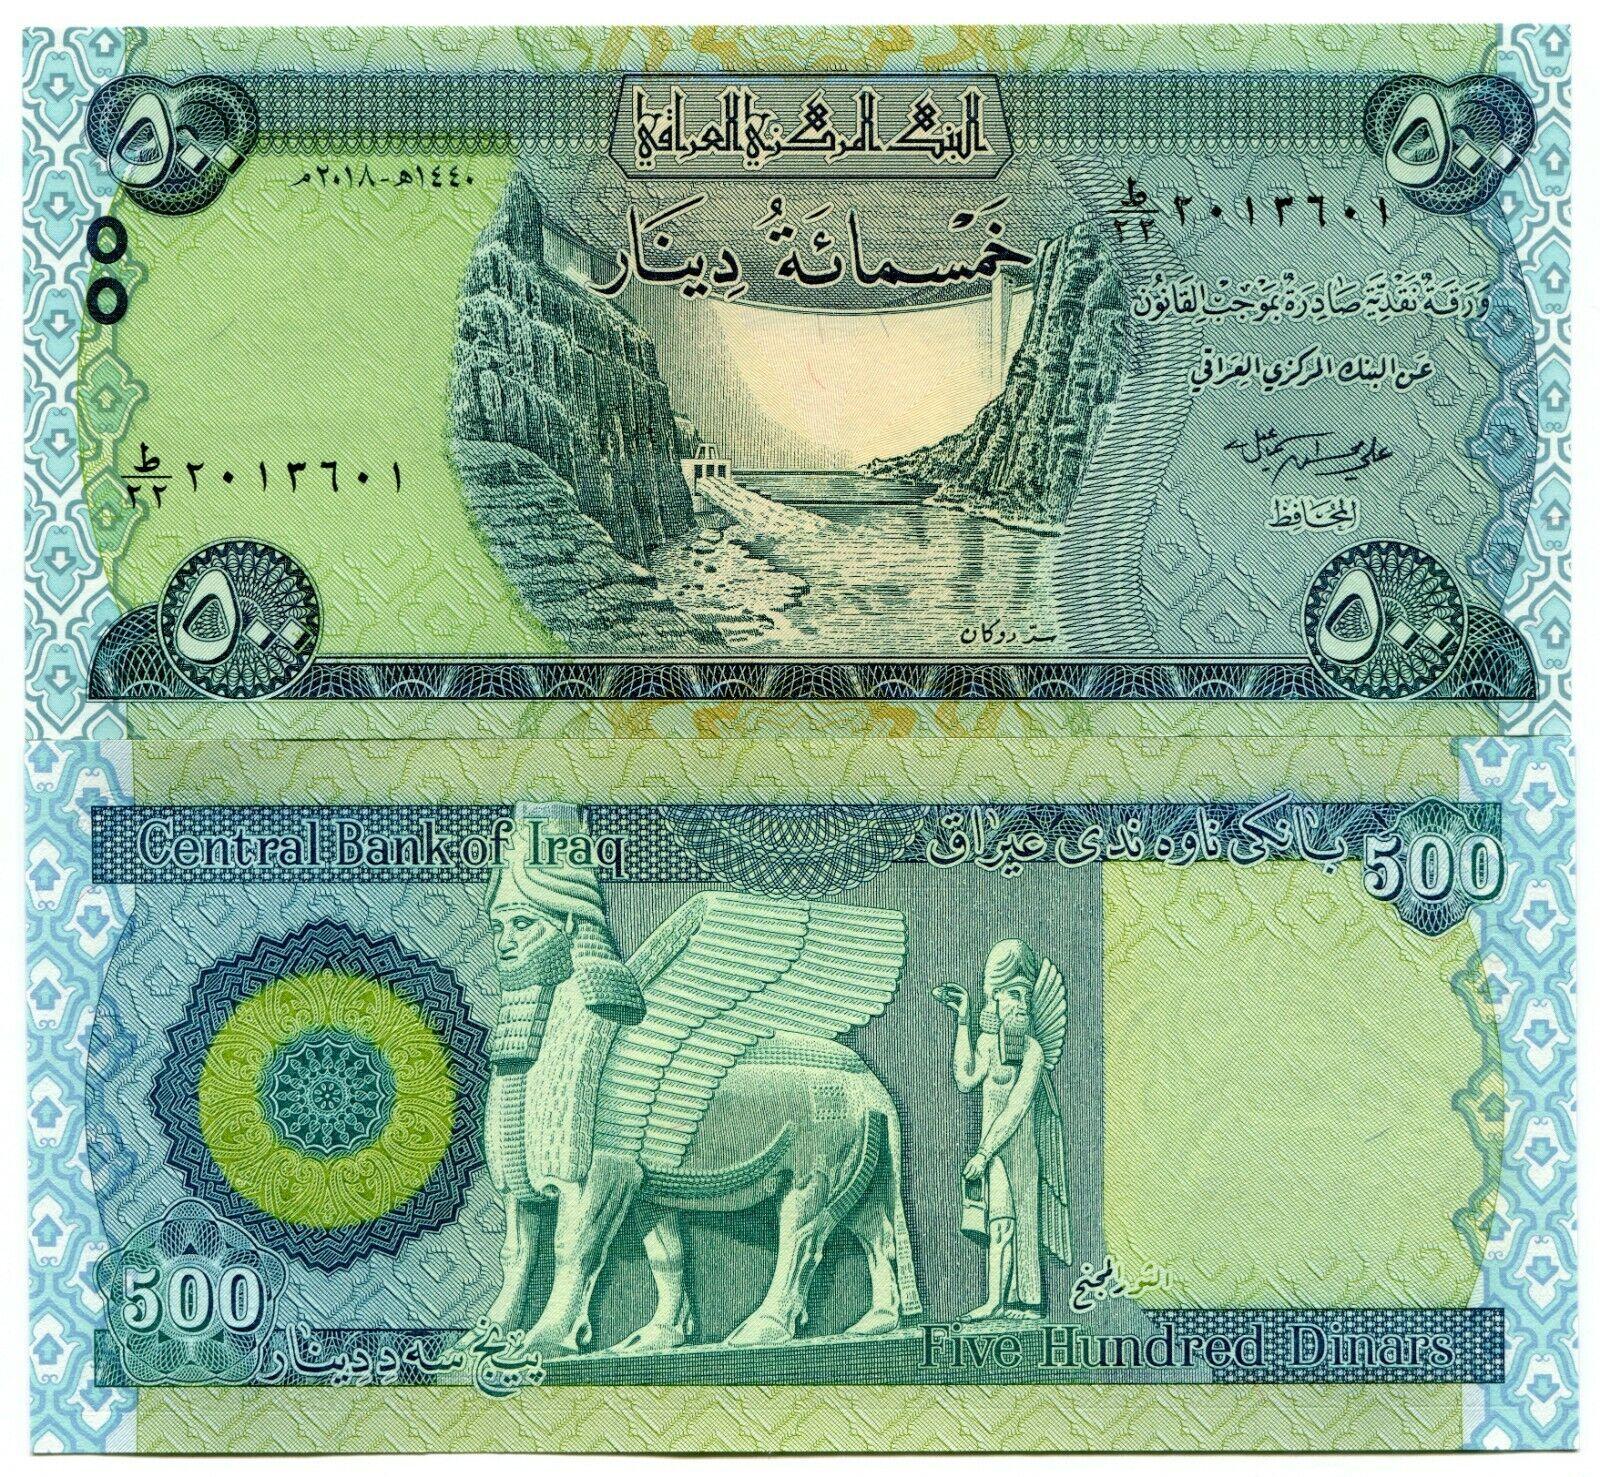 Iraqi Dinar 5000-5 X 1000   Unc Total Of 5000 Iraq Dinar Out Of A New Bundle